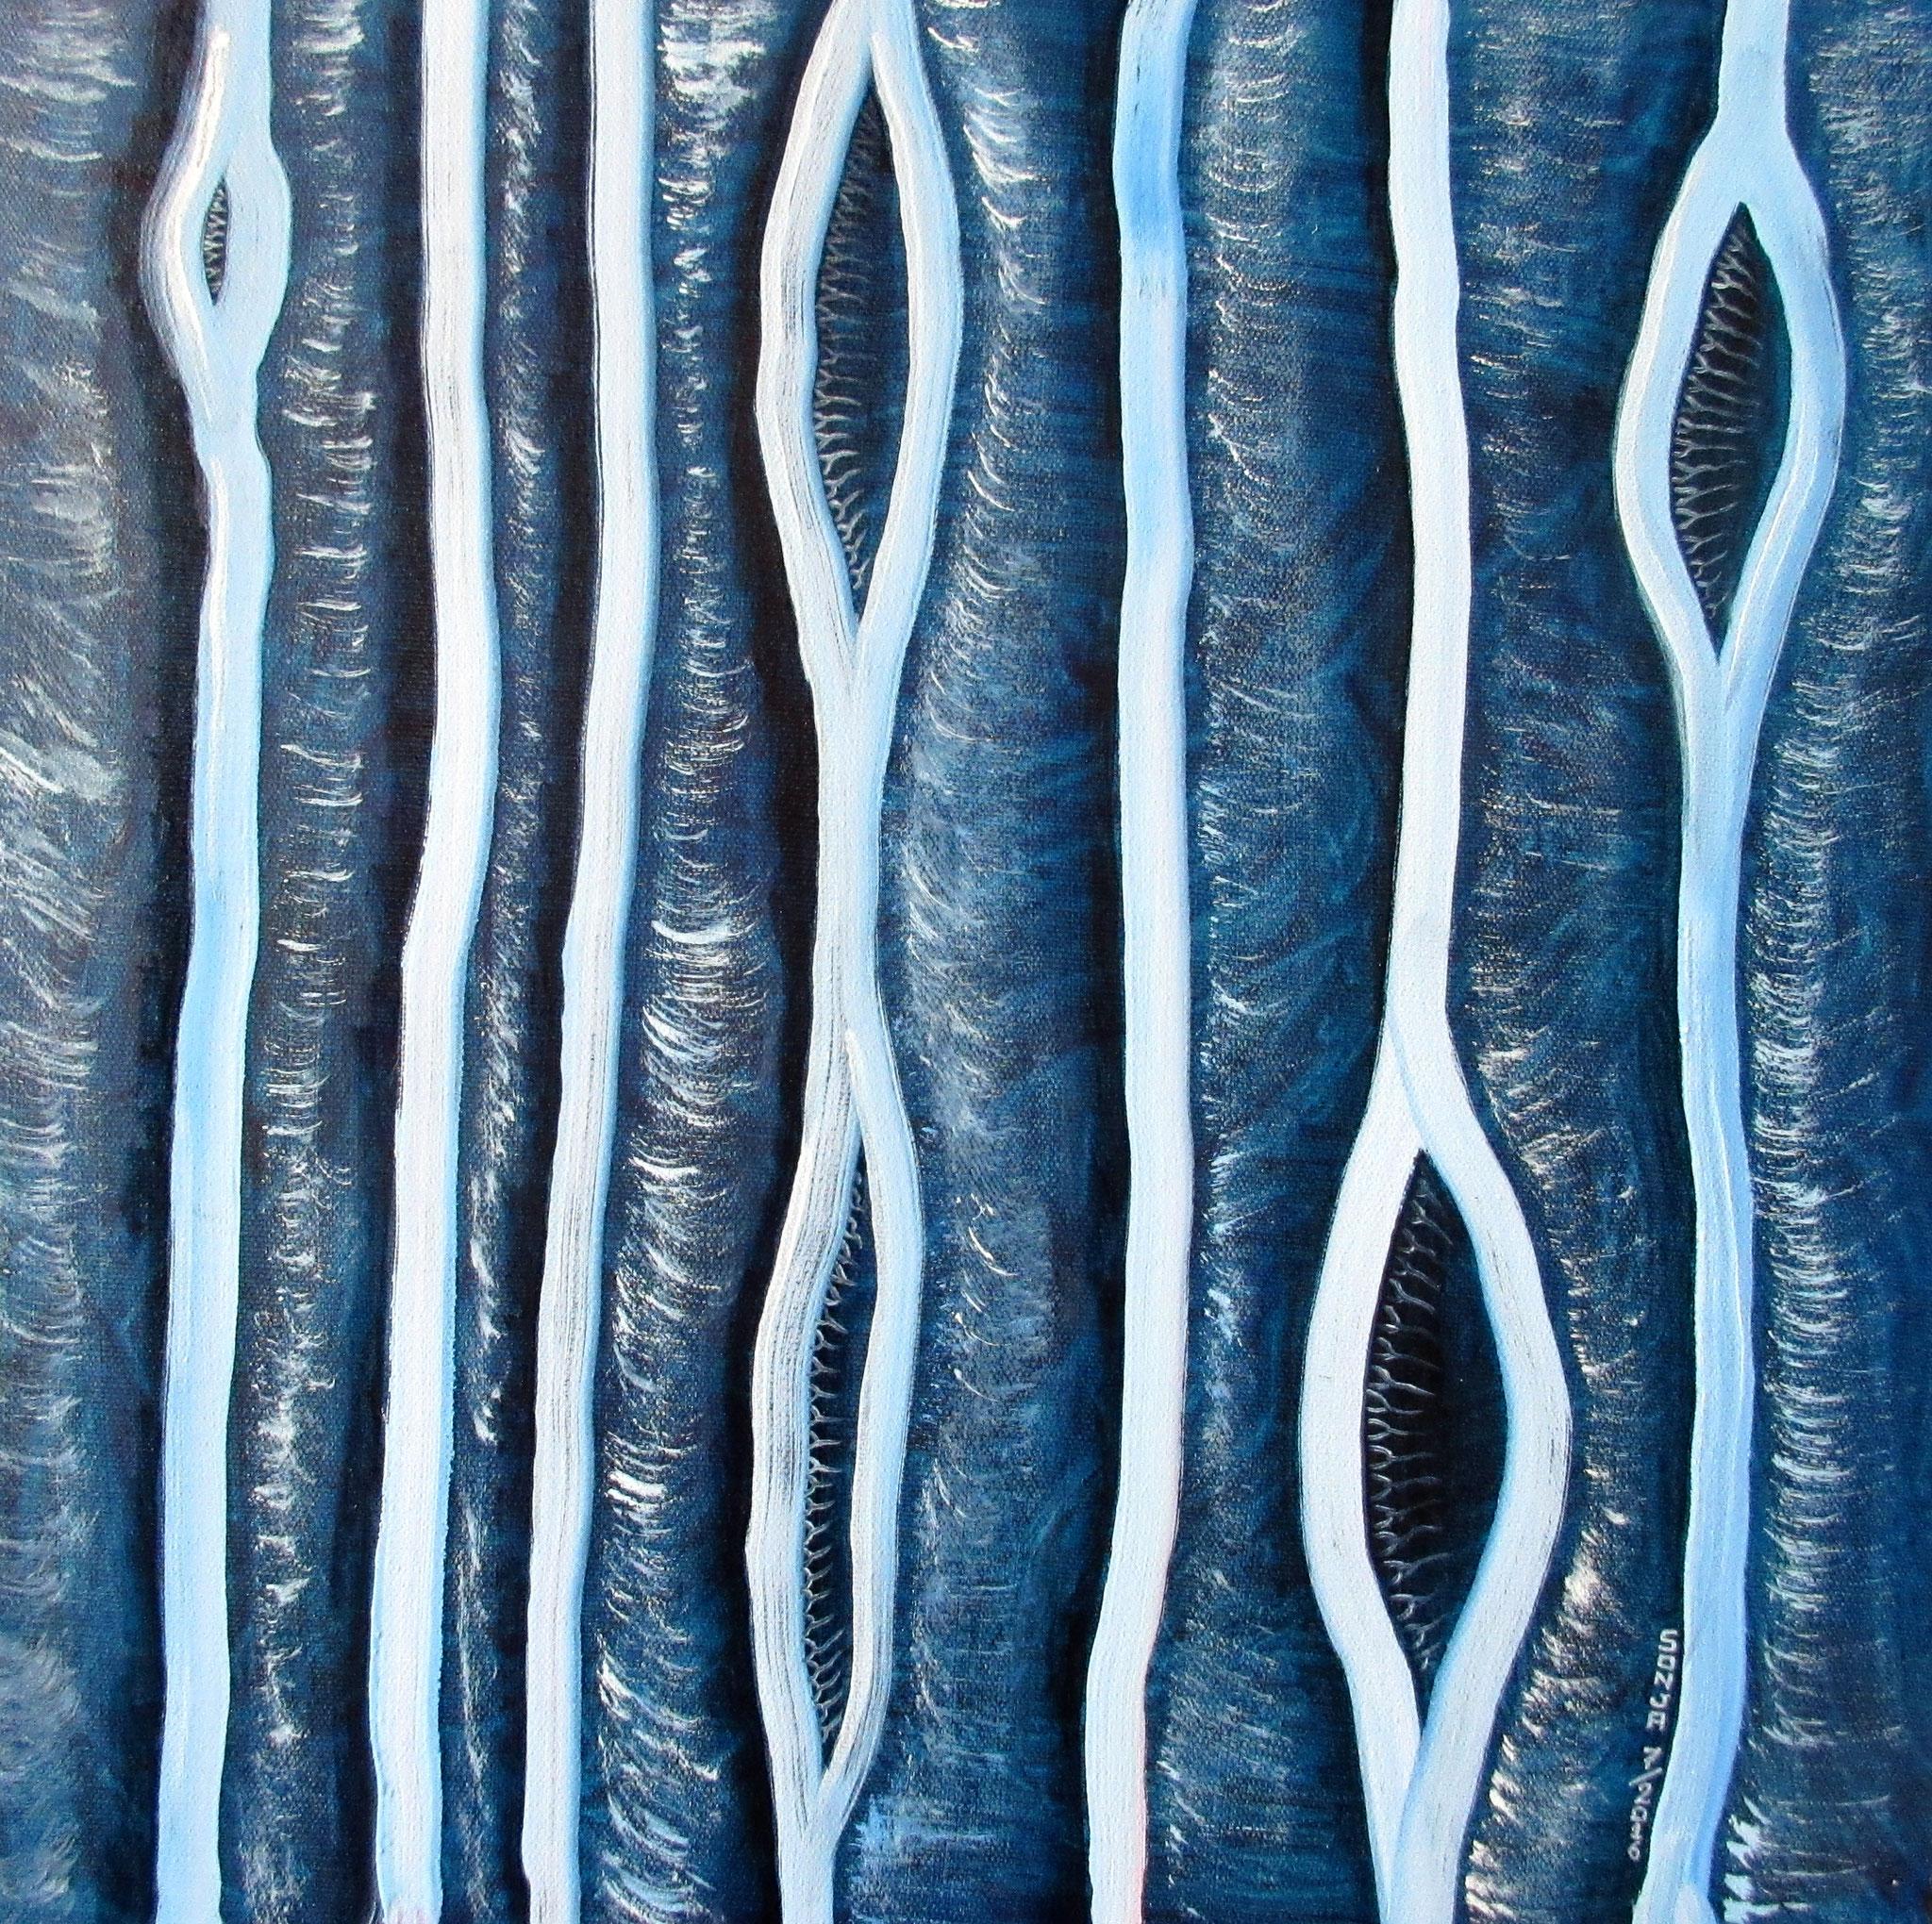 Oil & acrylic on canvas 16x16, July 2016 - (1/2)